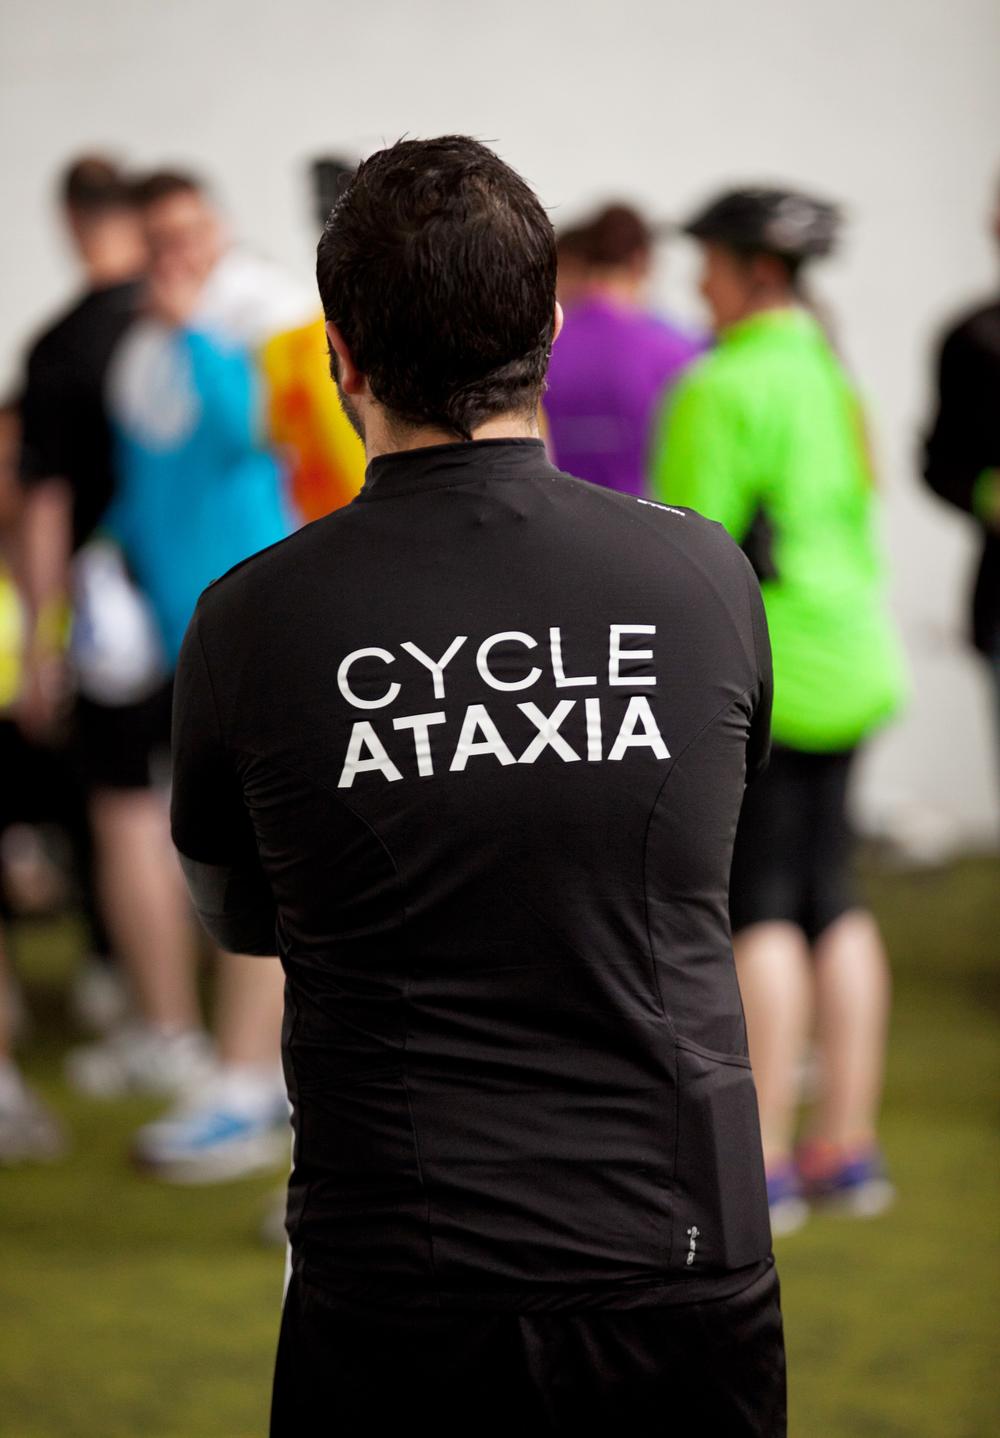 021_CycleAtaxia2015.jpg